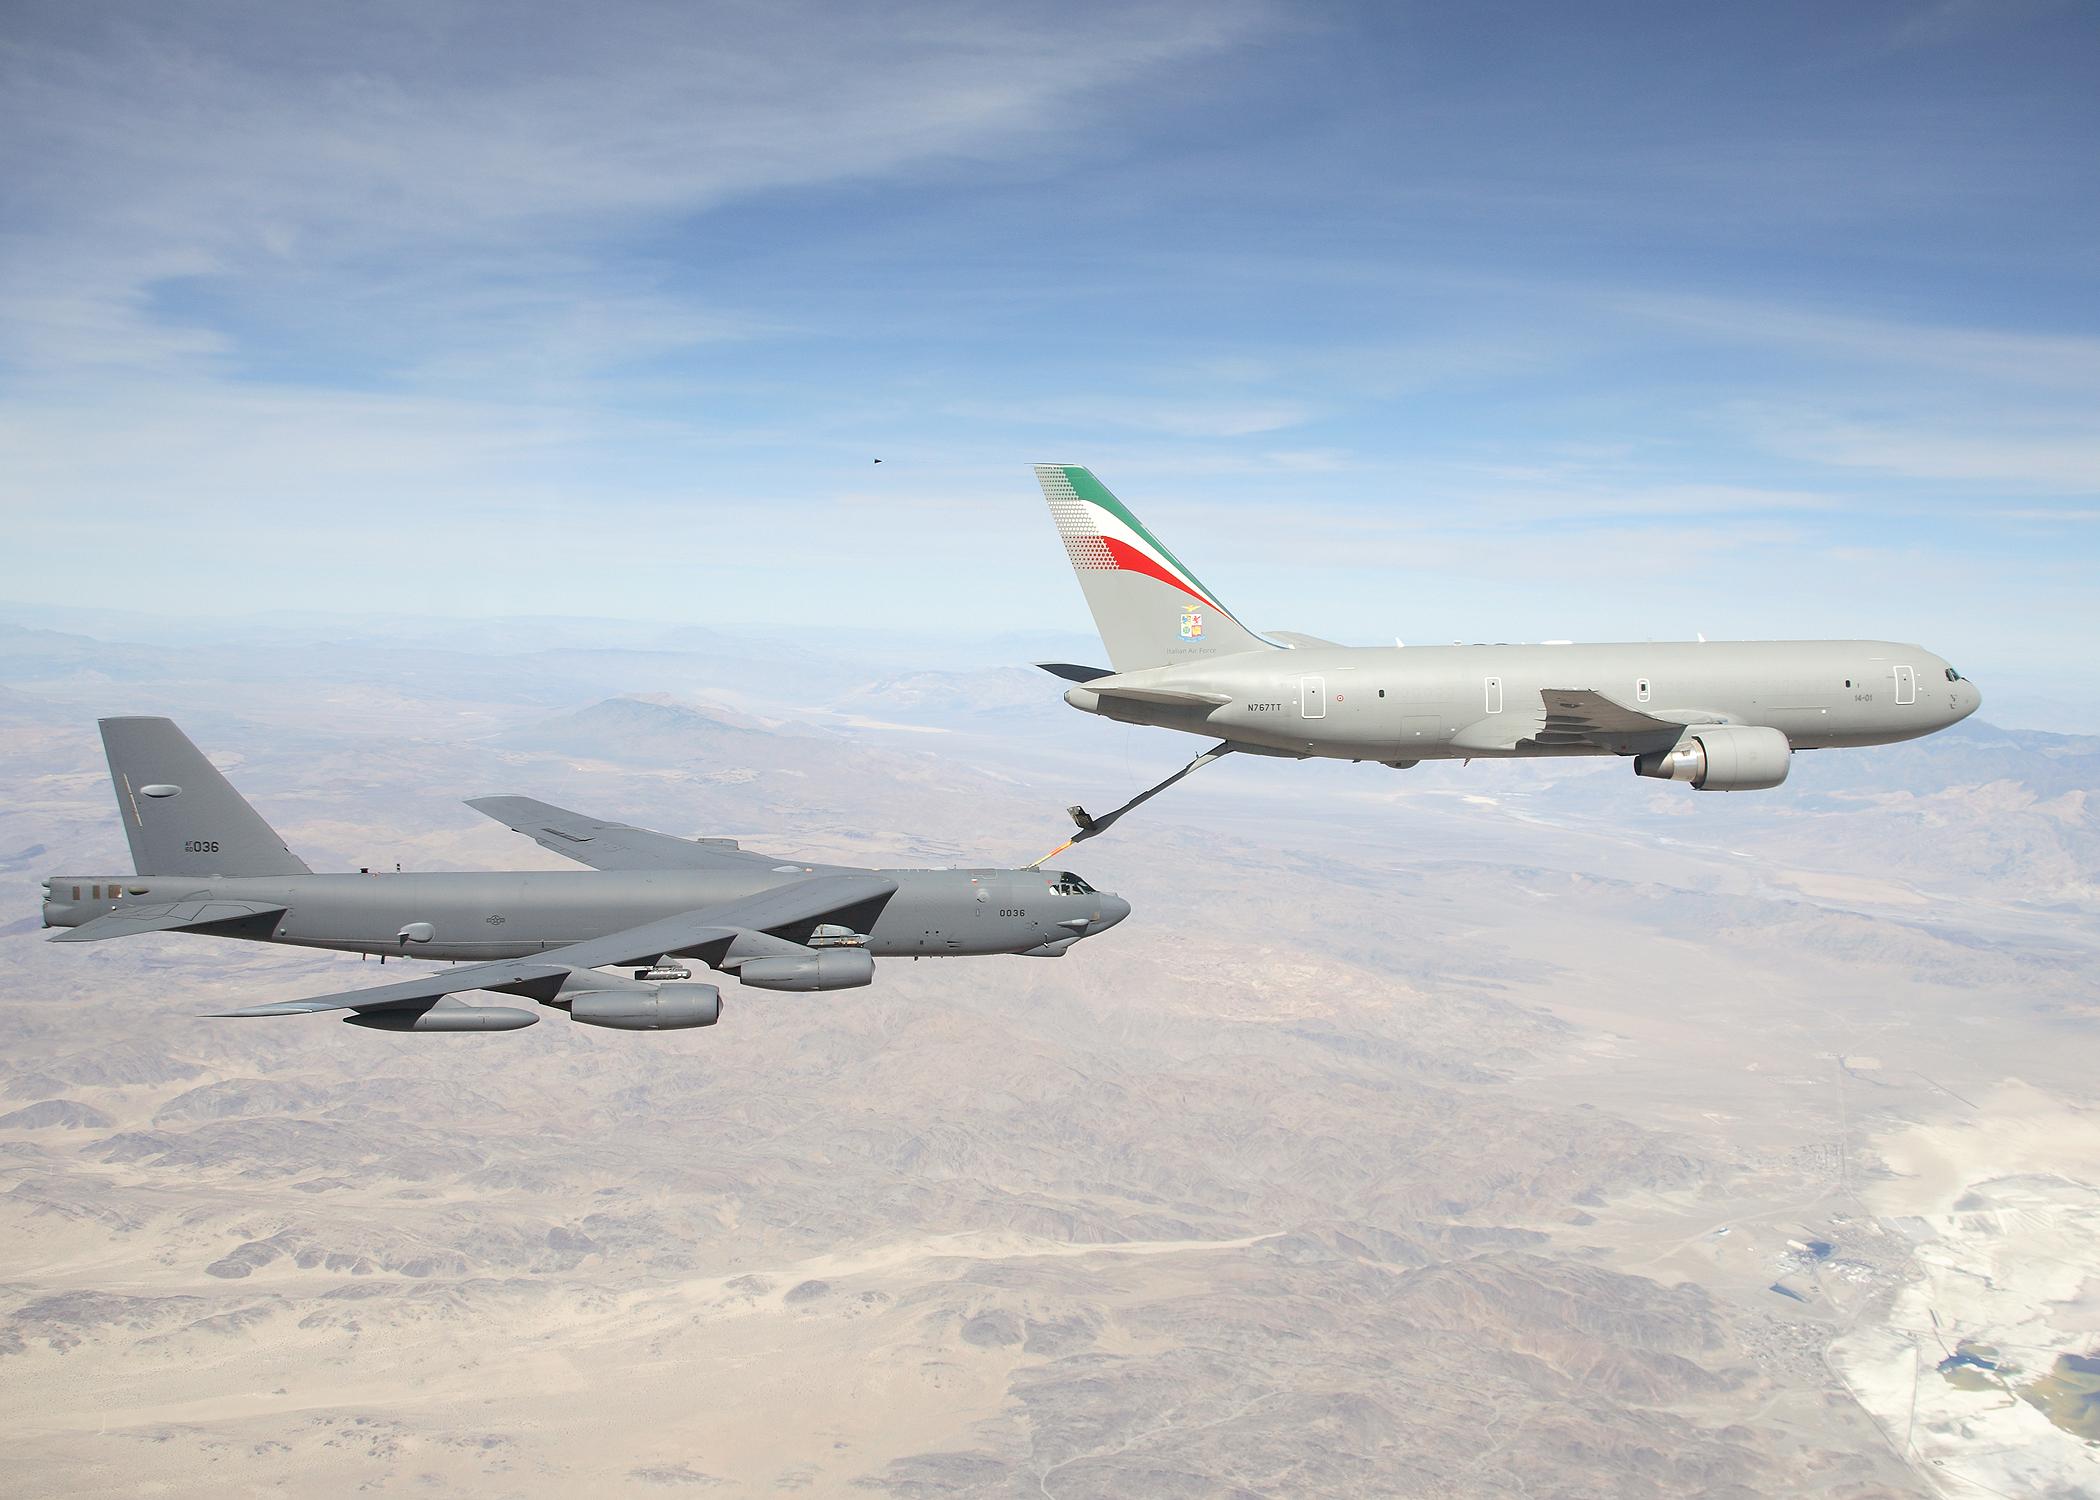 http://upload.wikimedia.org/wikipedia/commons/d/d7/KC-767_Aeronautica_Militare_refueling_B-52H_2007.jpg?uselang=ru